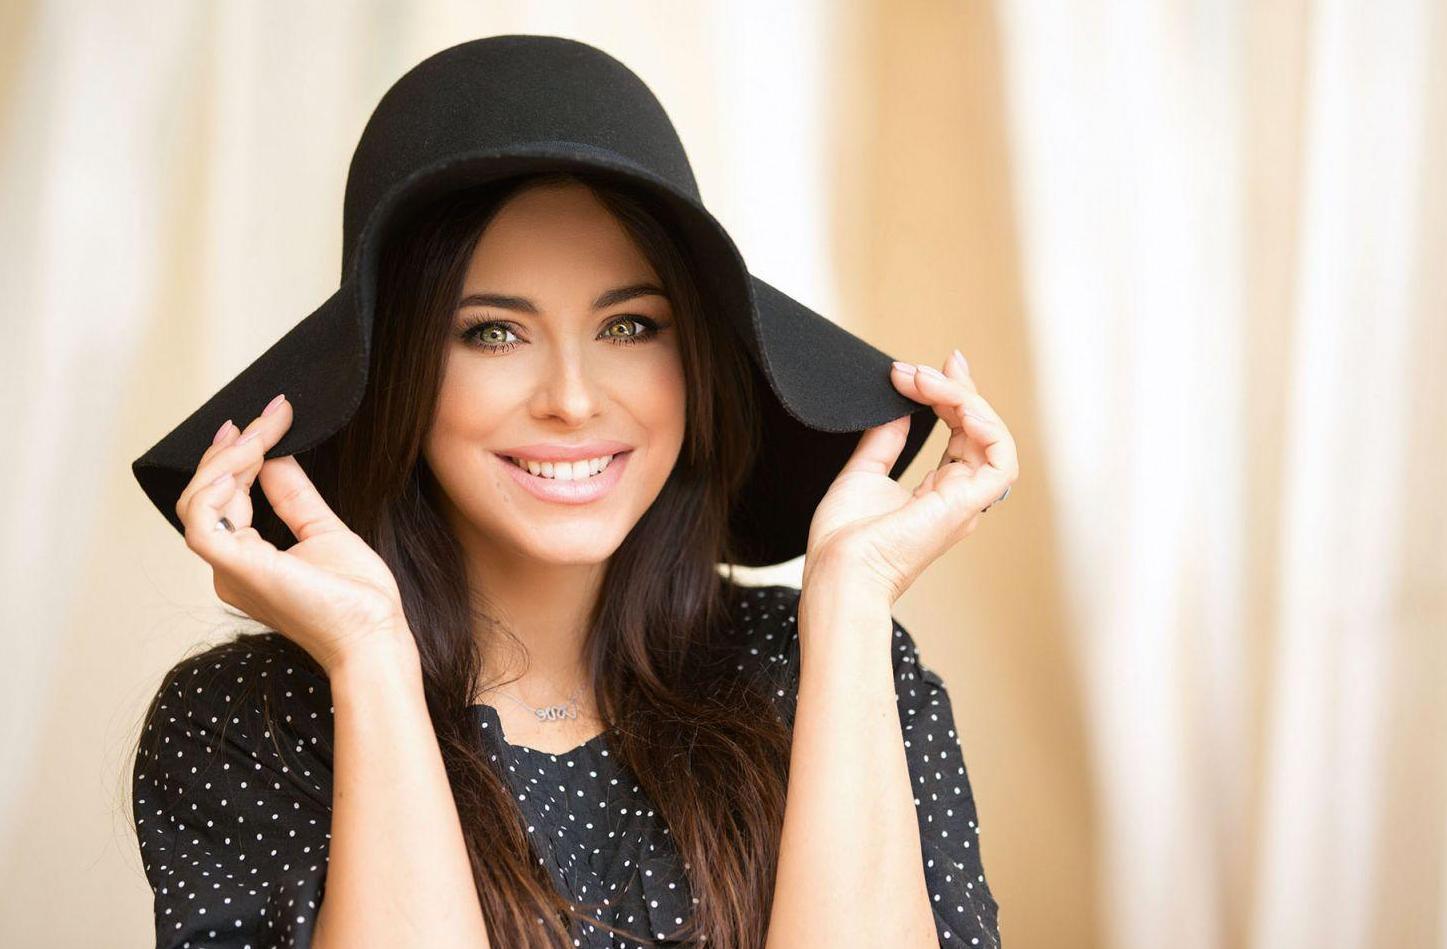 Ани Лорак ходит на шопинг в Киеве